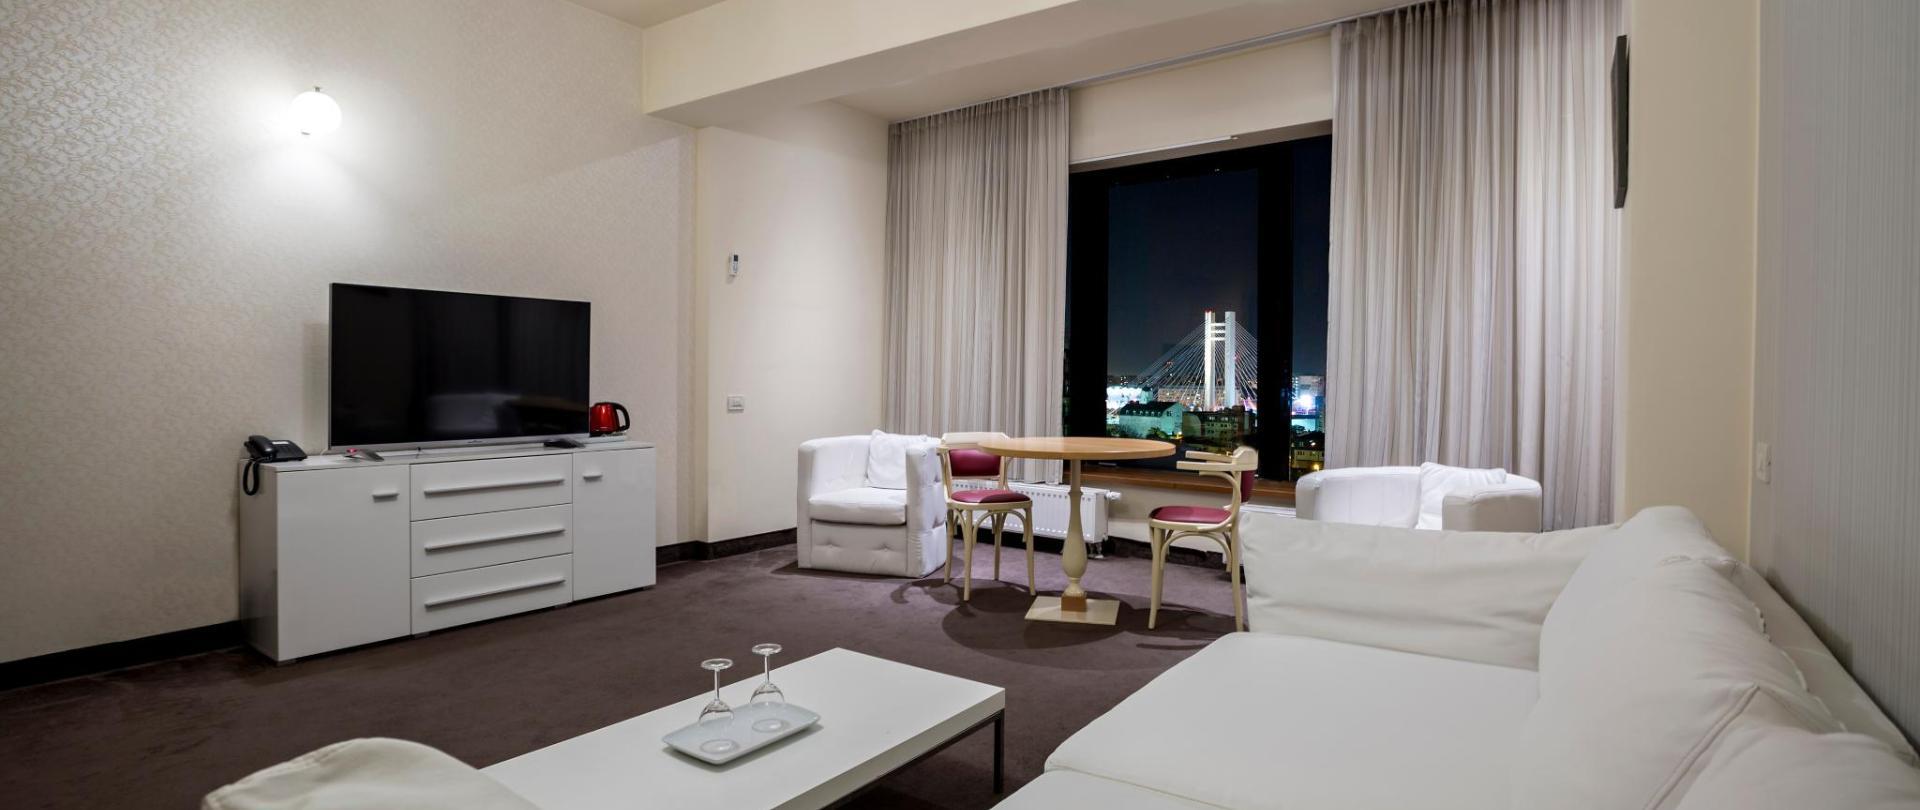 room5113_fotosoto.ro-12.jpg